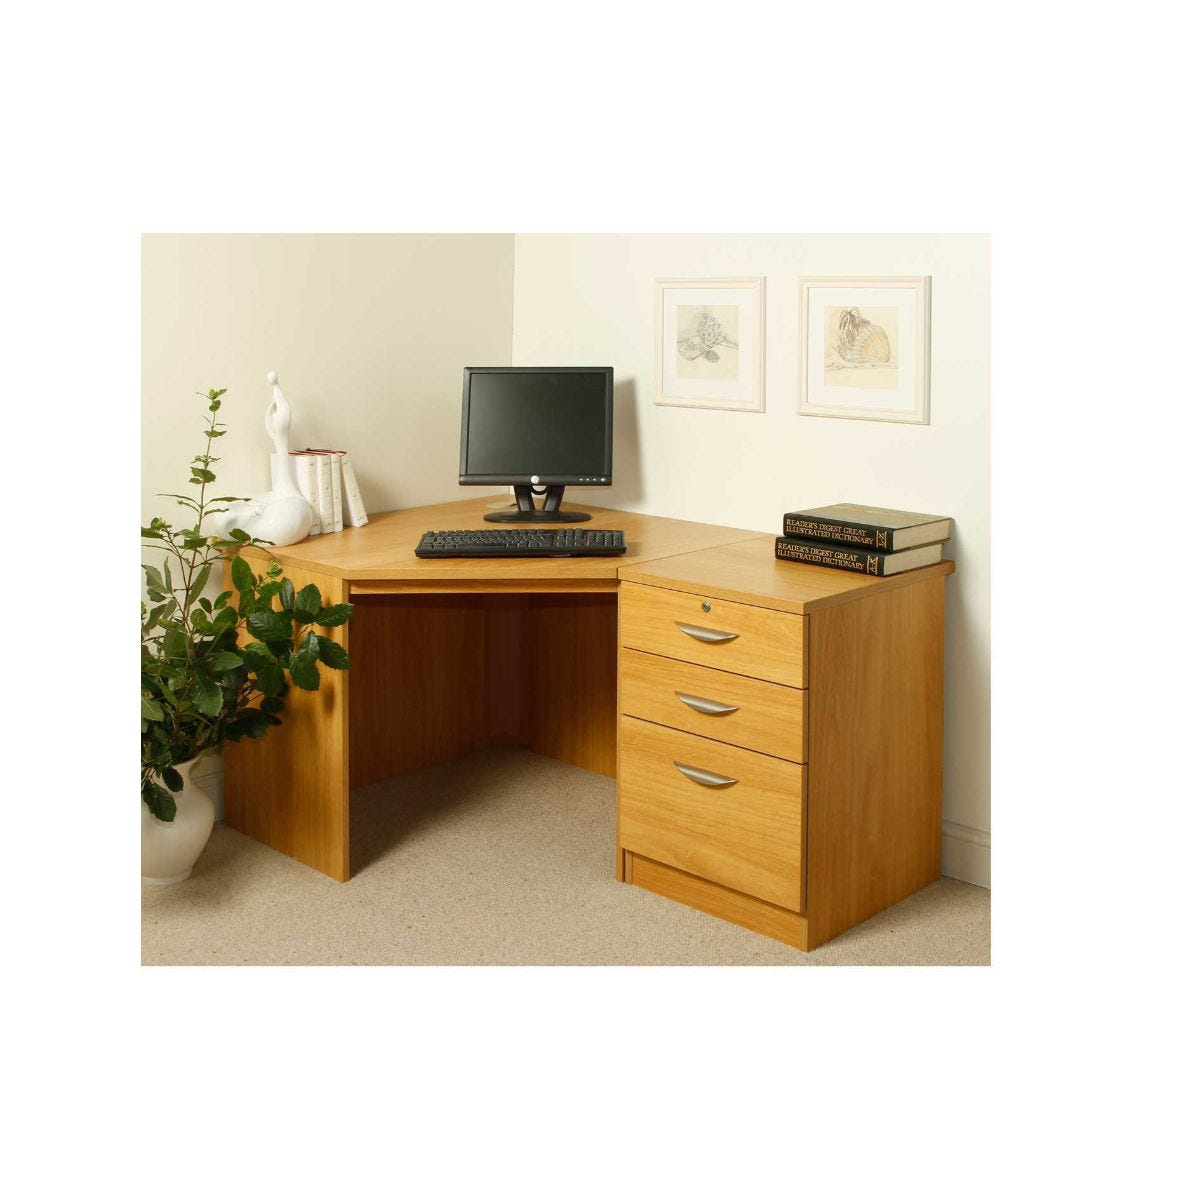 R White Burne Jones Desk Workstation, Walnut